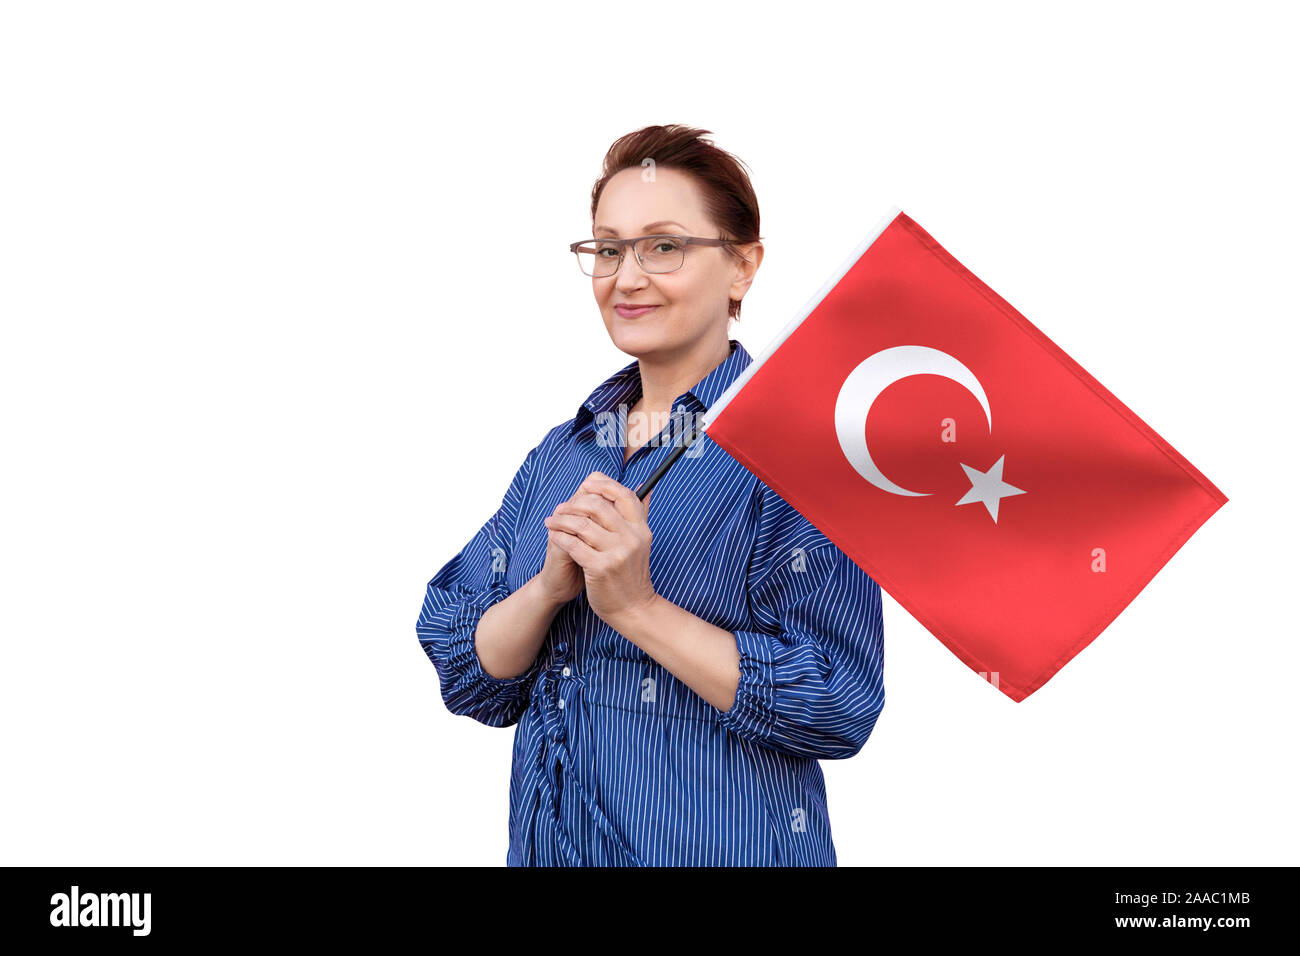 Turkey flag. Woman holding Turkish flag. Nice portrait of middle aged lady 40 50 years old holding a large flag isolated on white background. Stock Photo